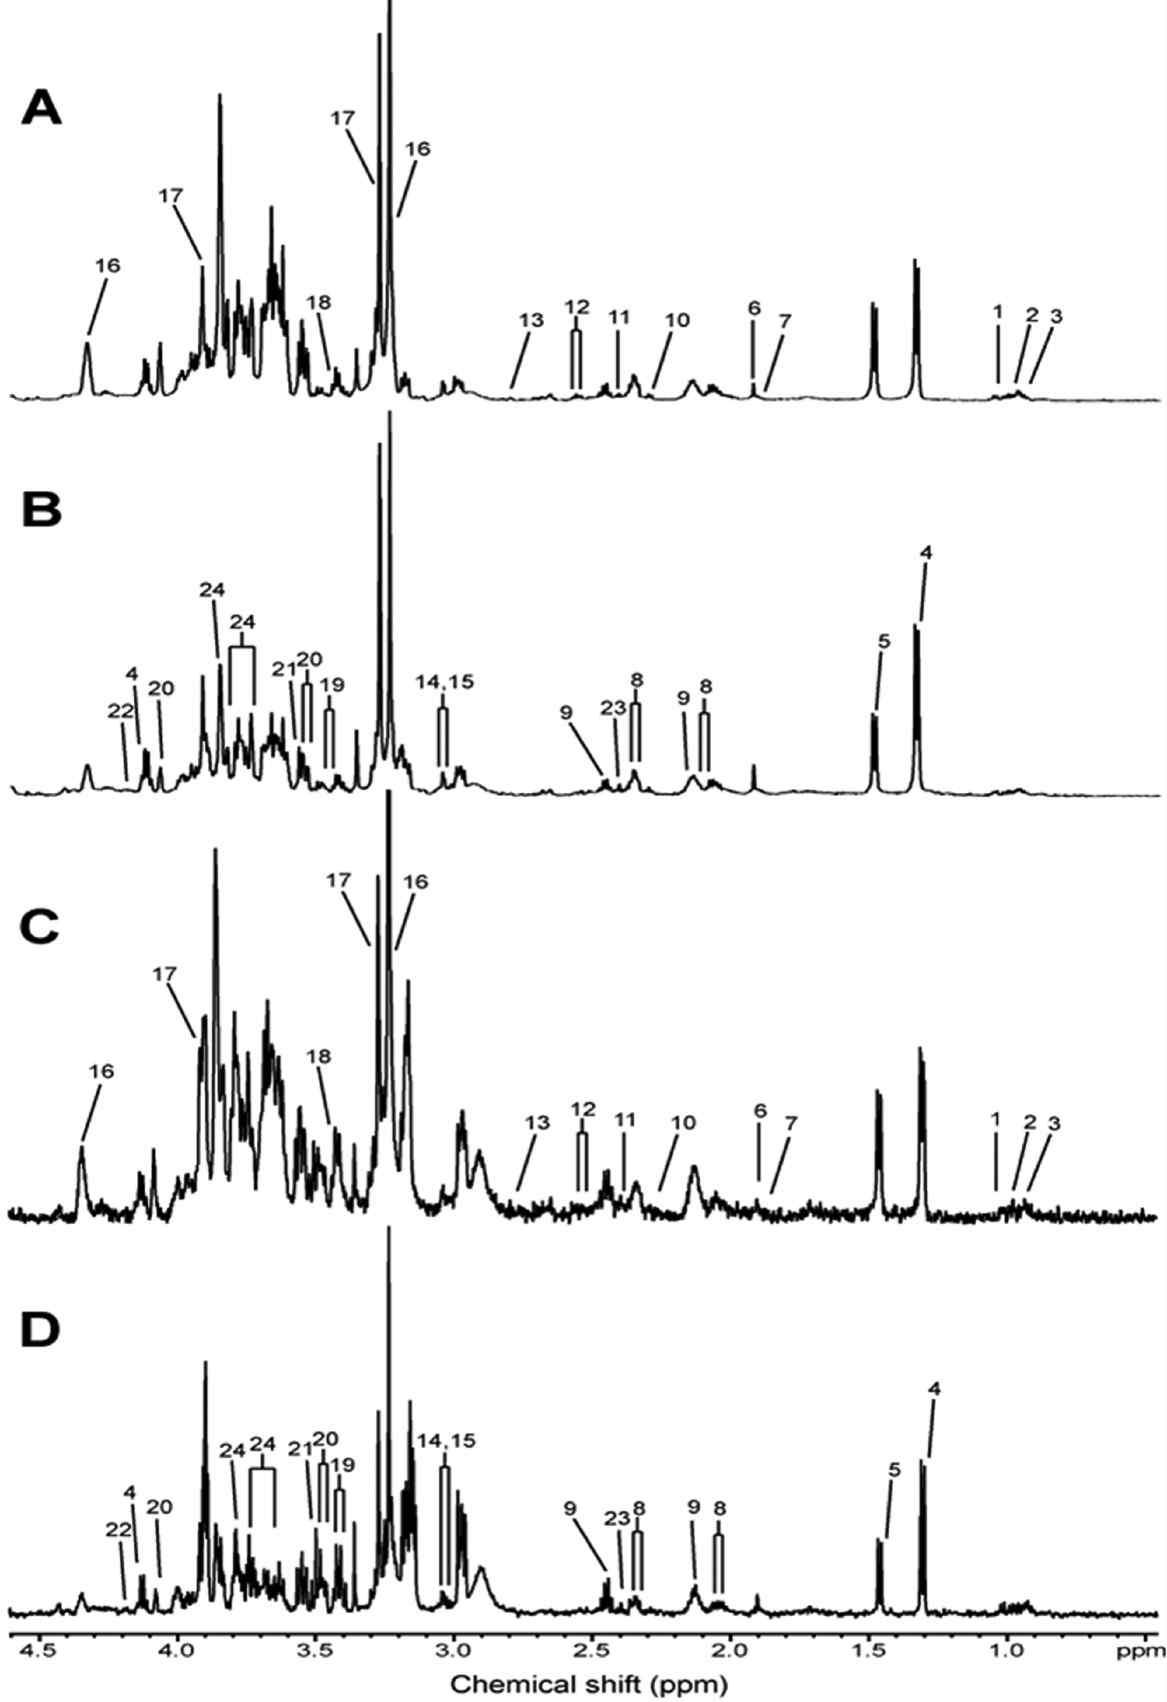 Inner medullary collecting duct (IMCD) 세포 추출 시료에 대한 대표 NMR 스펙트럼